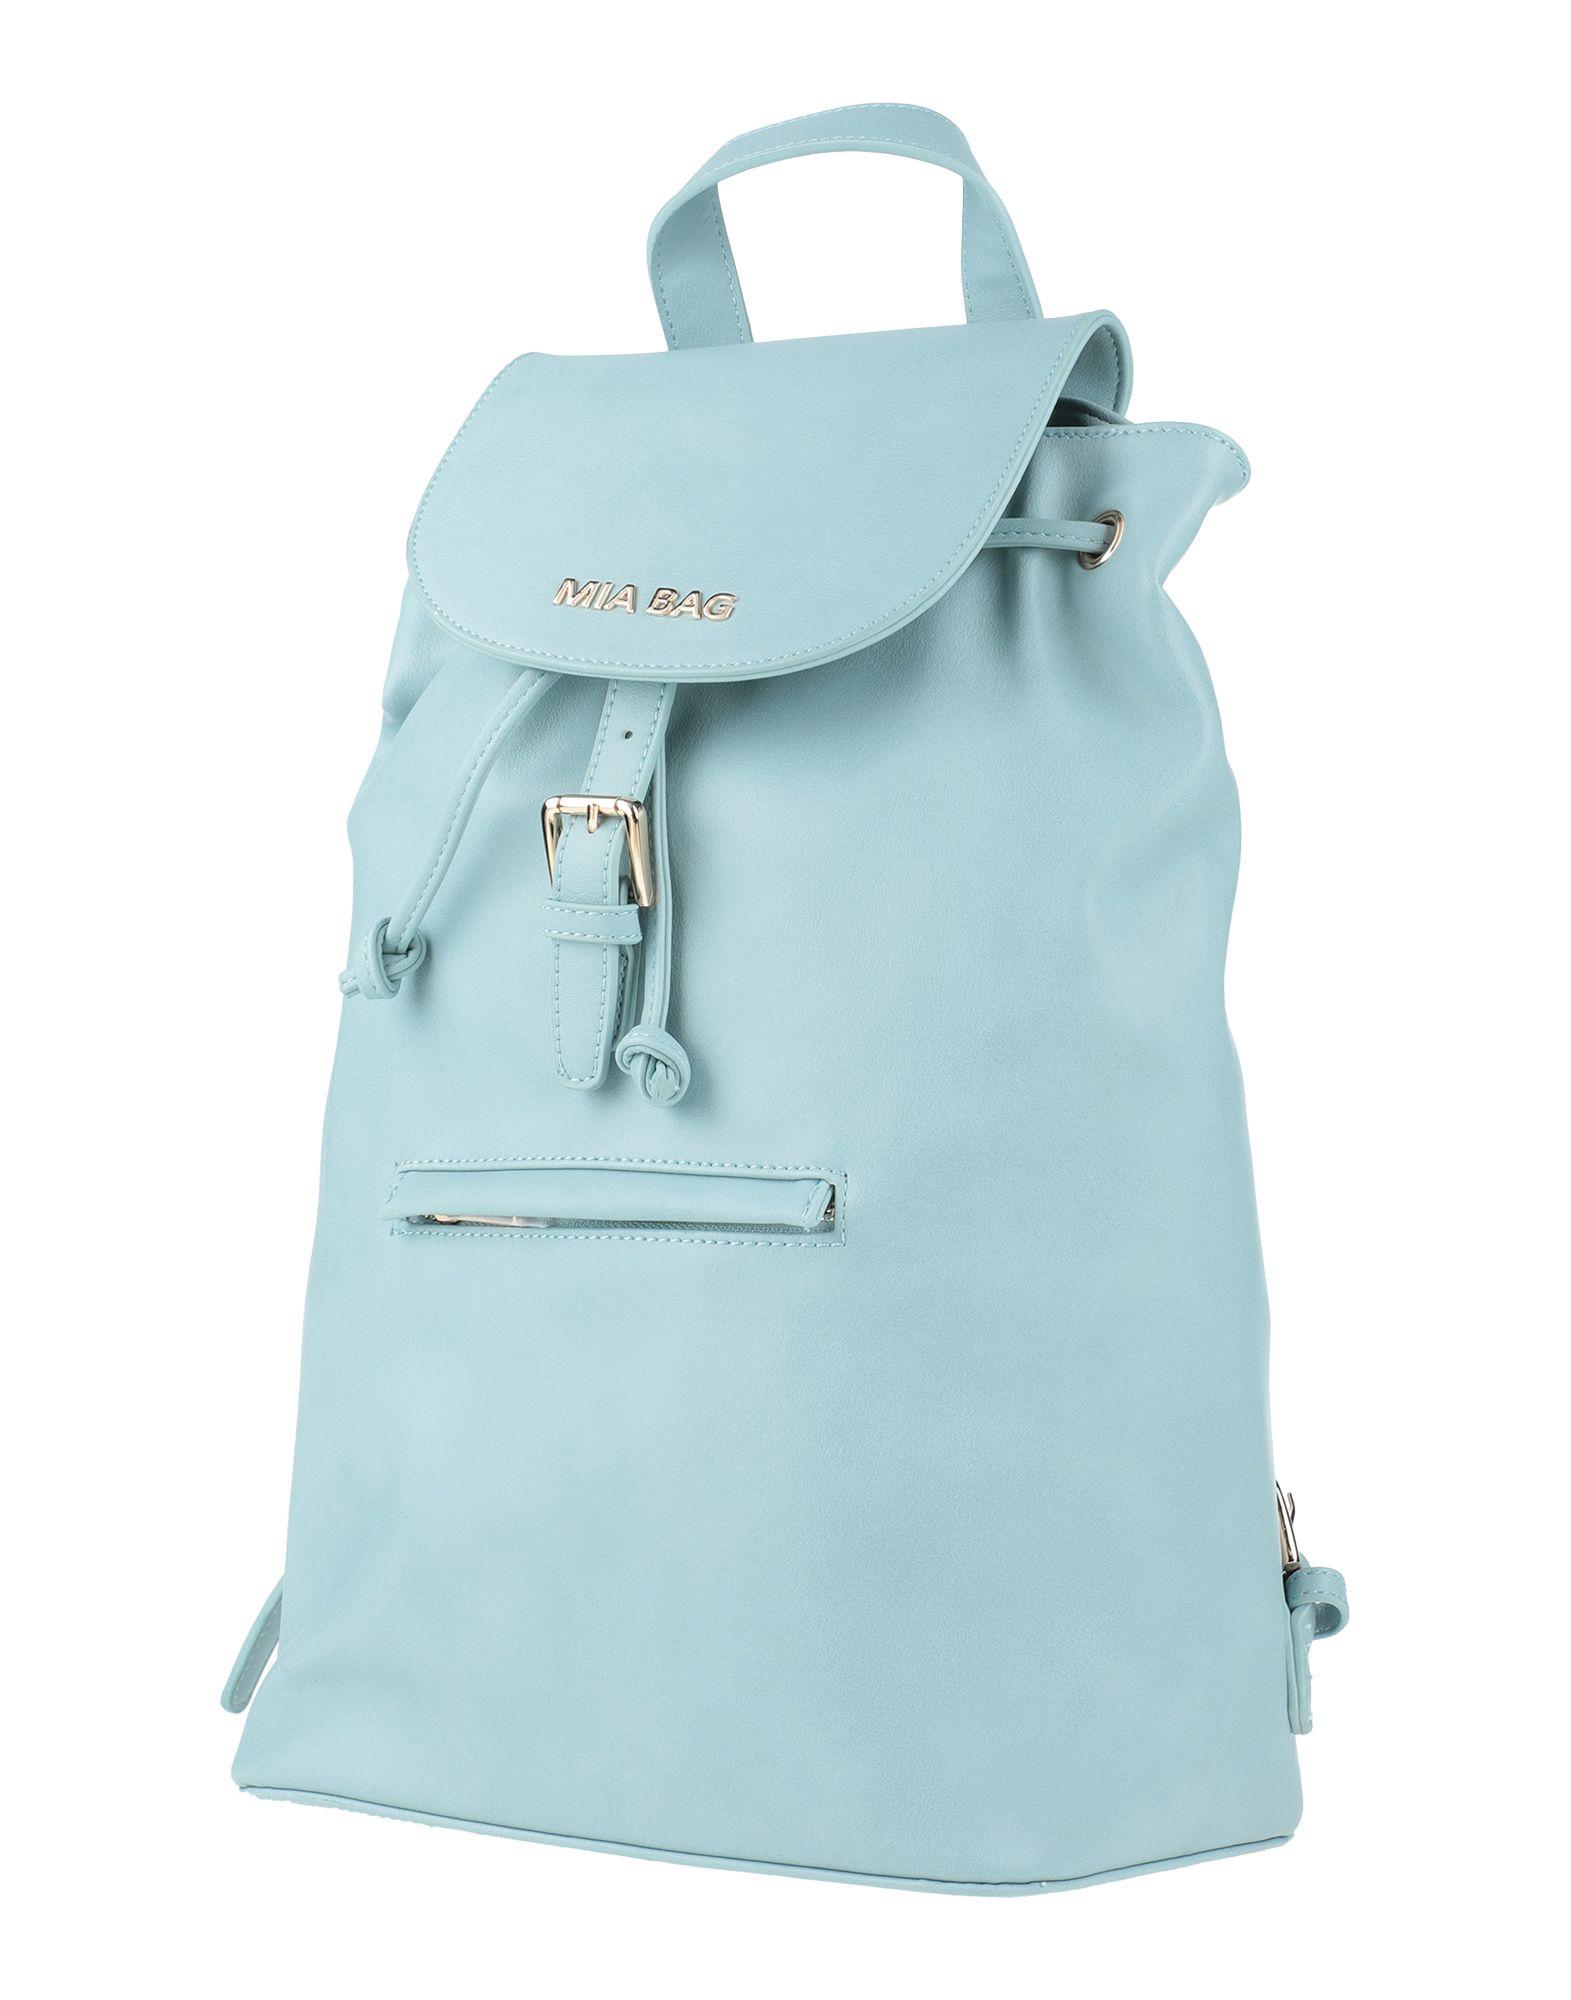 MIA BAG Рюкзаки и сумки на пояс сумки magnolia сумка женская a761 7363 лак искусственная кожа page 8